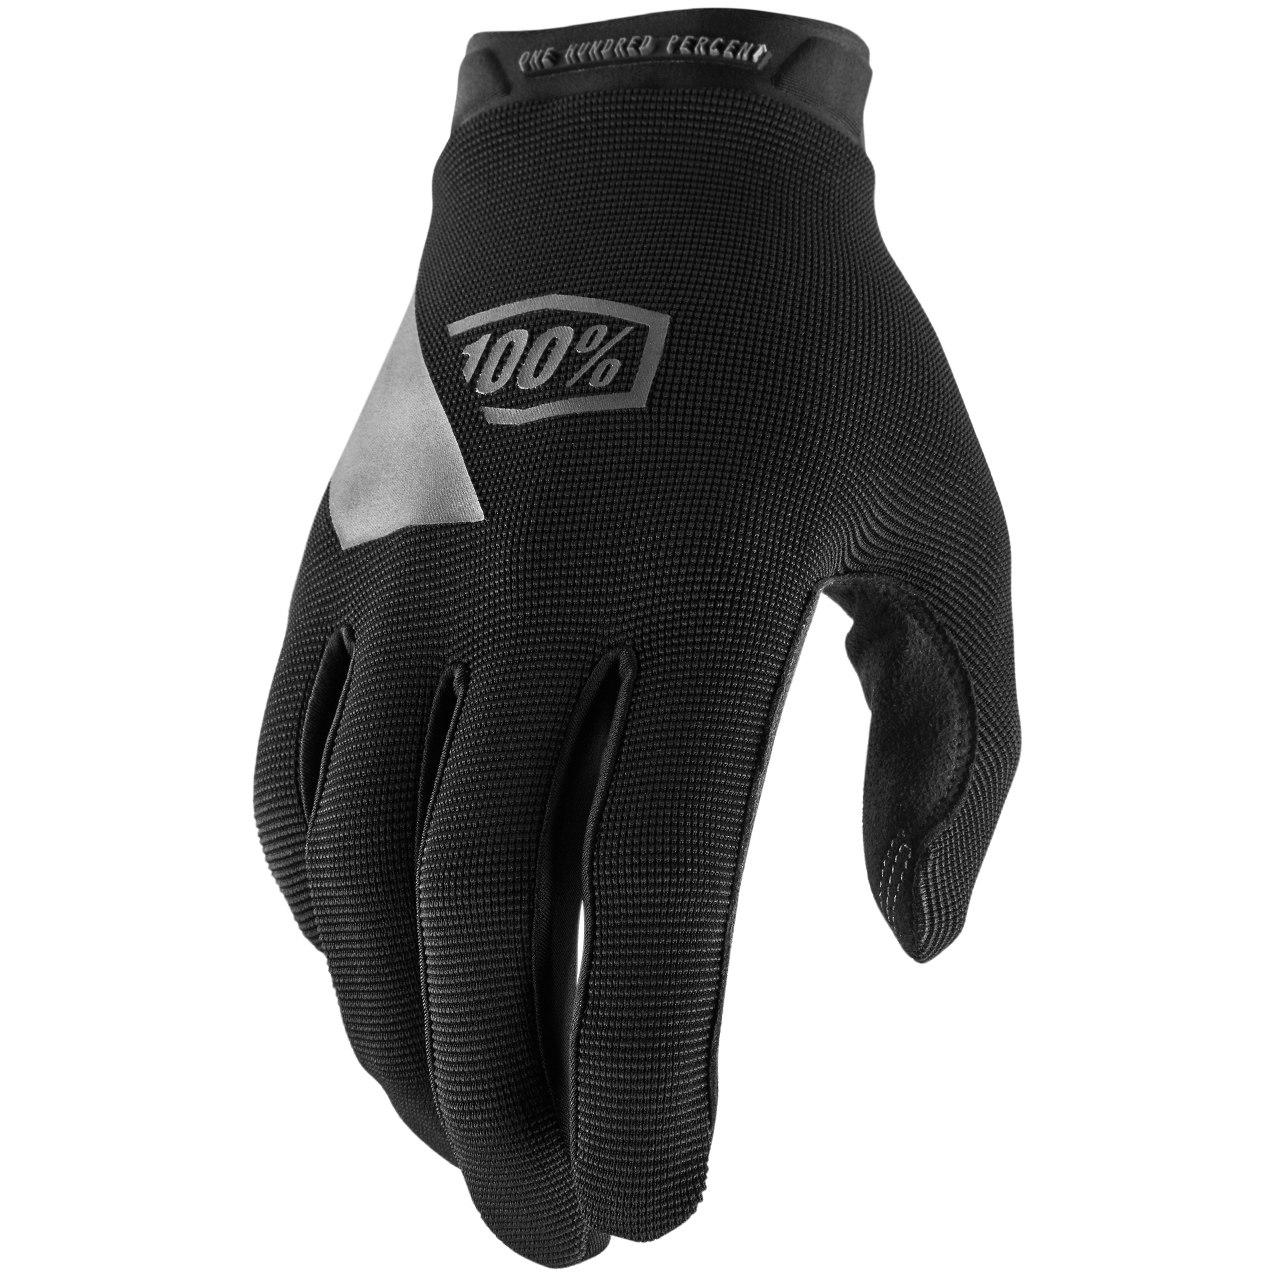 100% Ridecamp Glove - Black